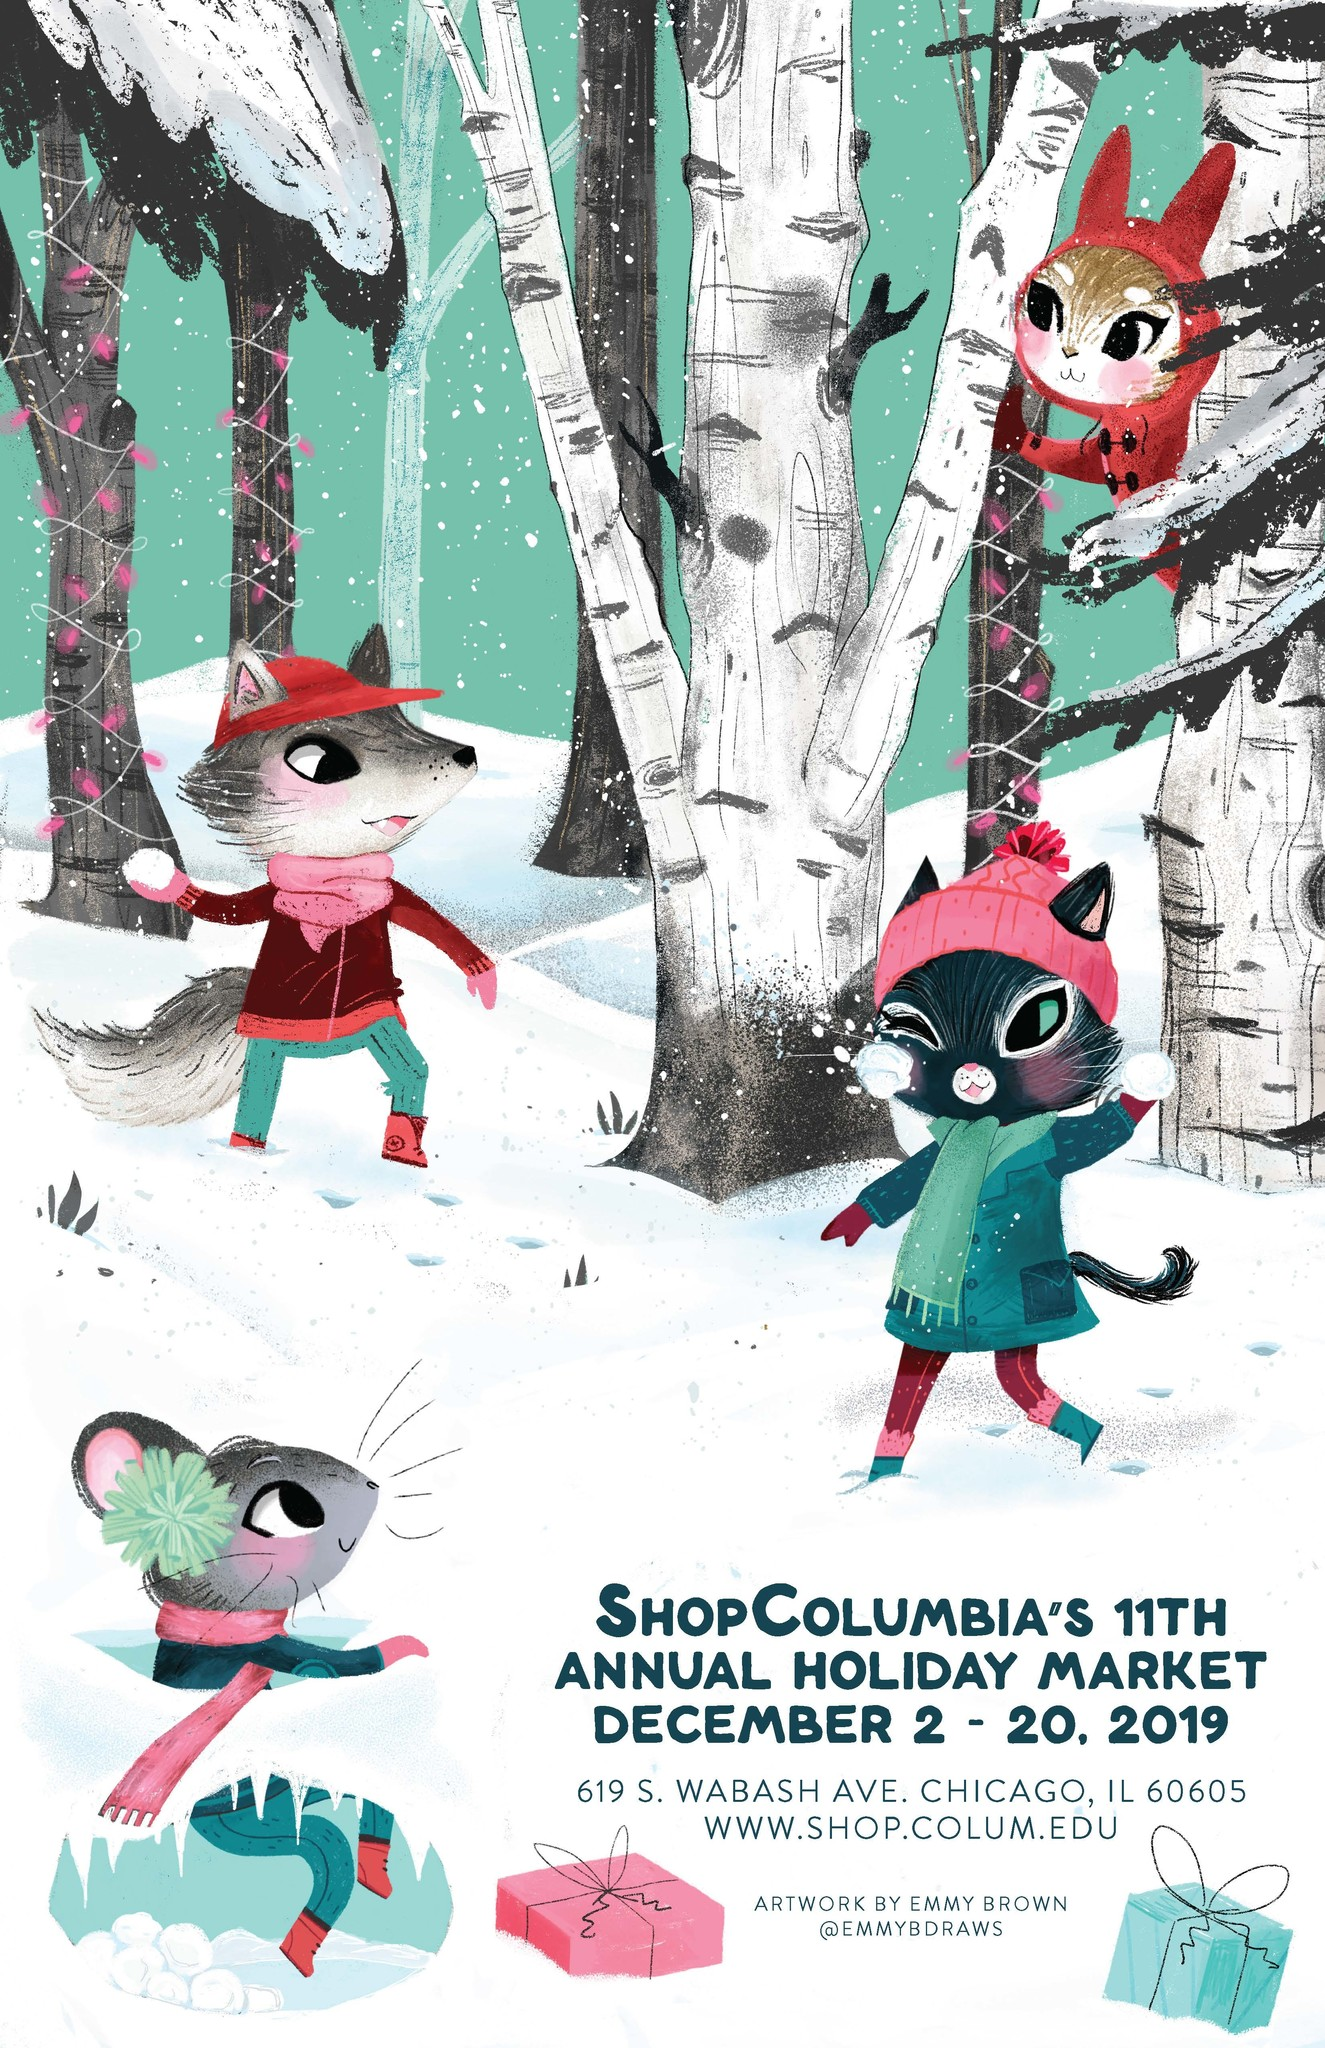 ShopColumbia's 11th Annual Holiday Market